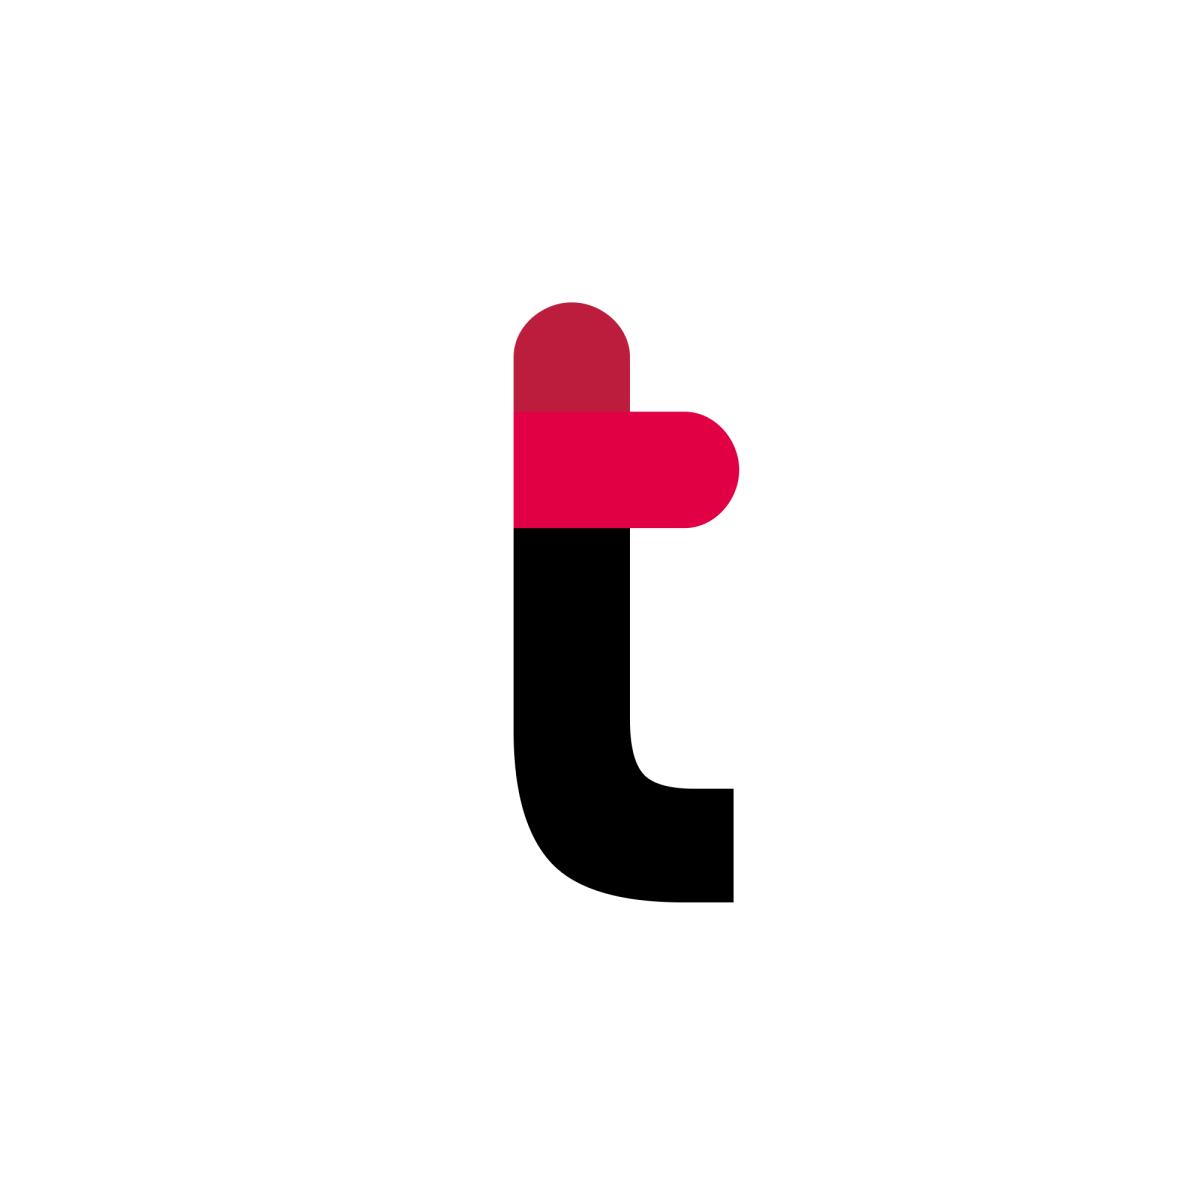 Thrivent United States Letter T Letter Logo Lettering